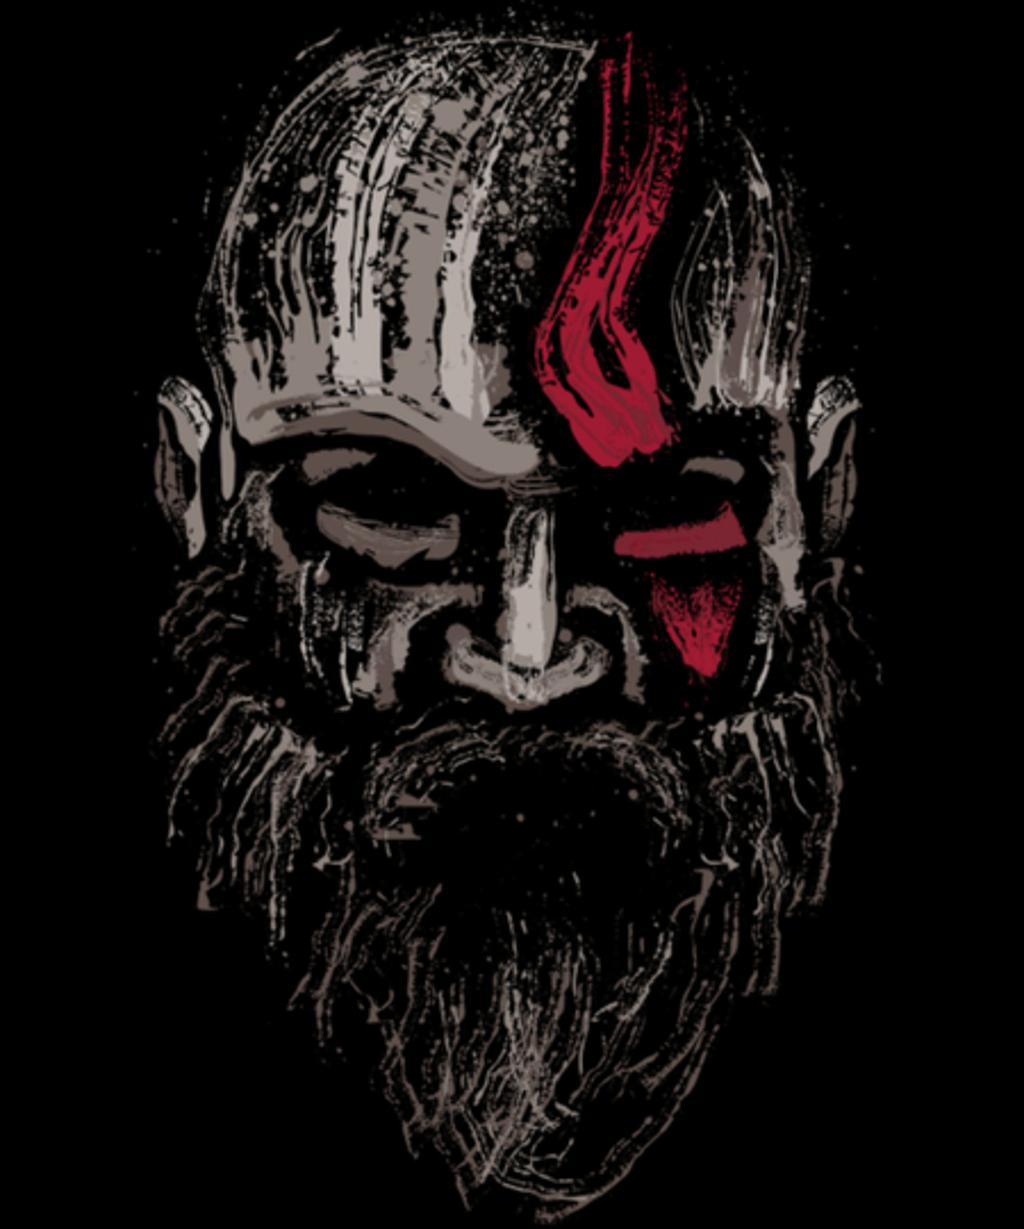 Qwertee: The Warrior of gods